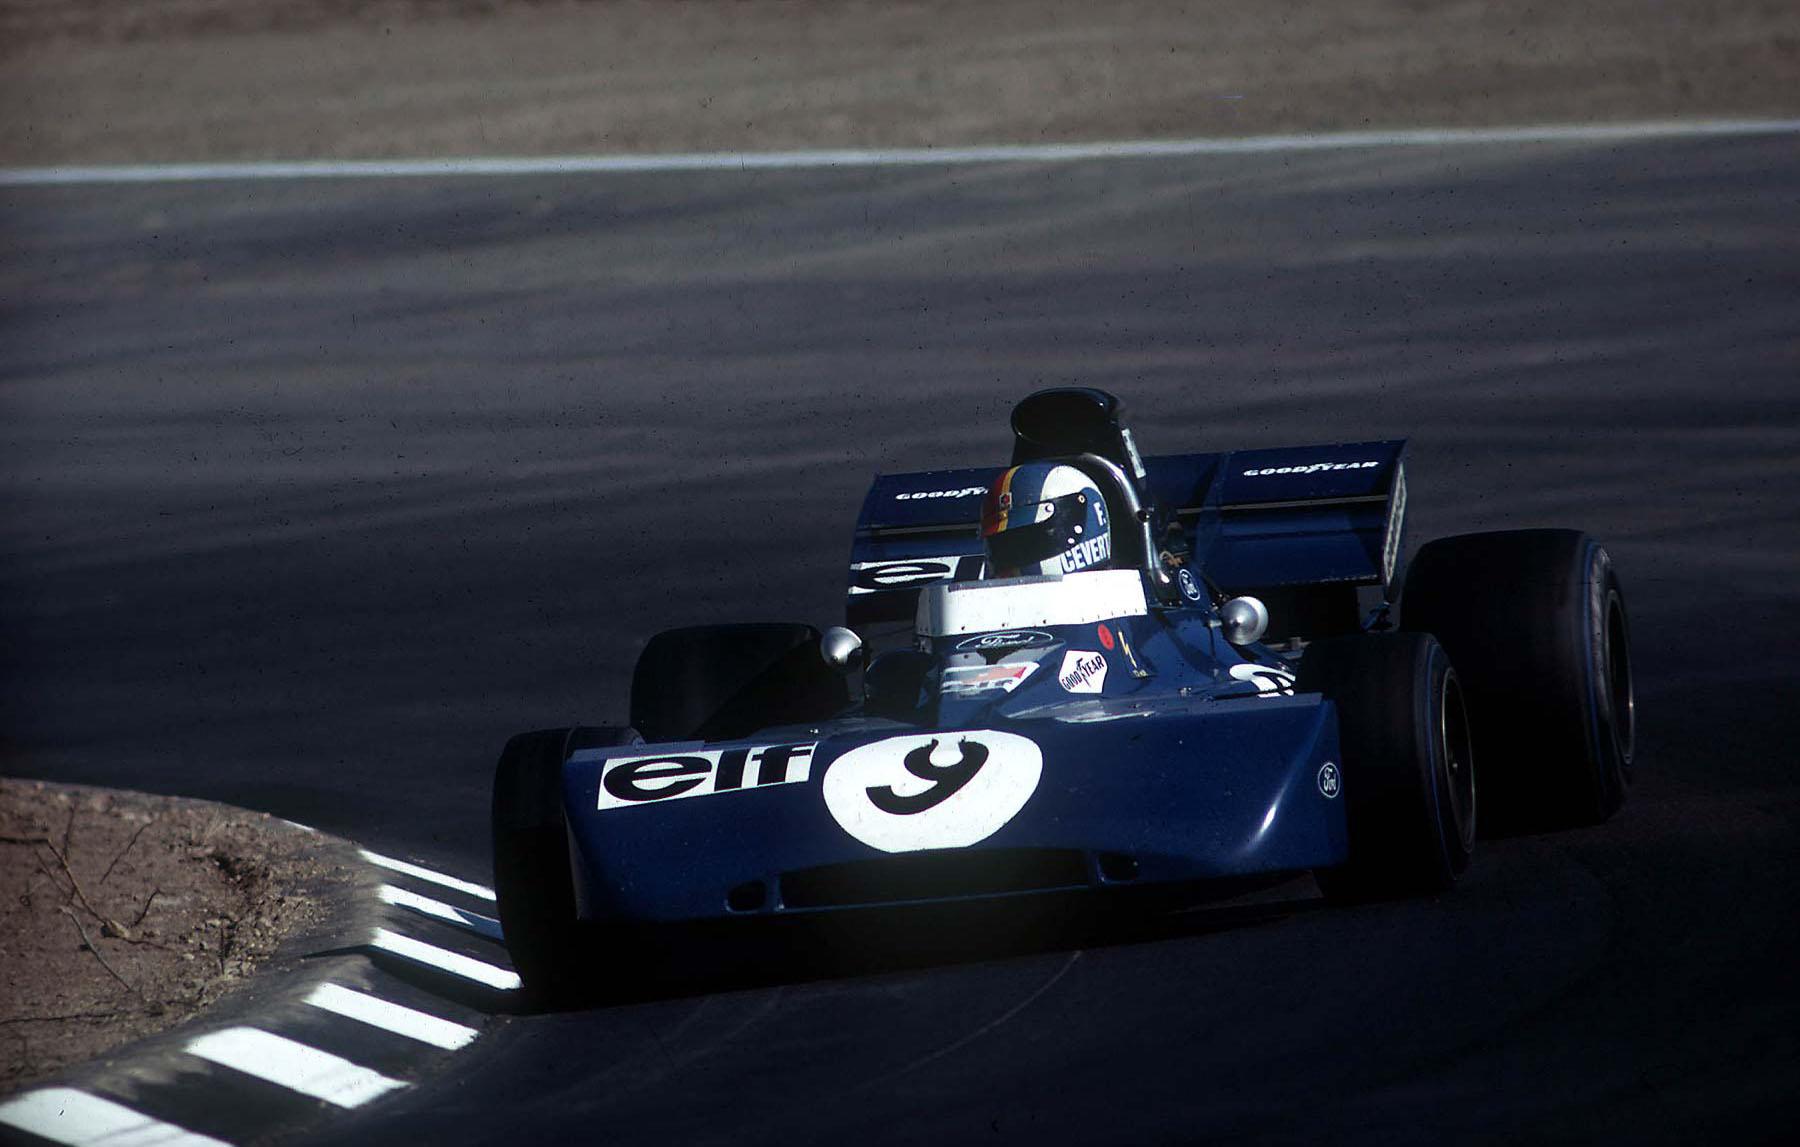 Francois Cevert Tyrrell watkins glen usa gp f1 1971